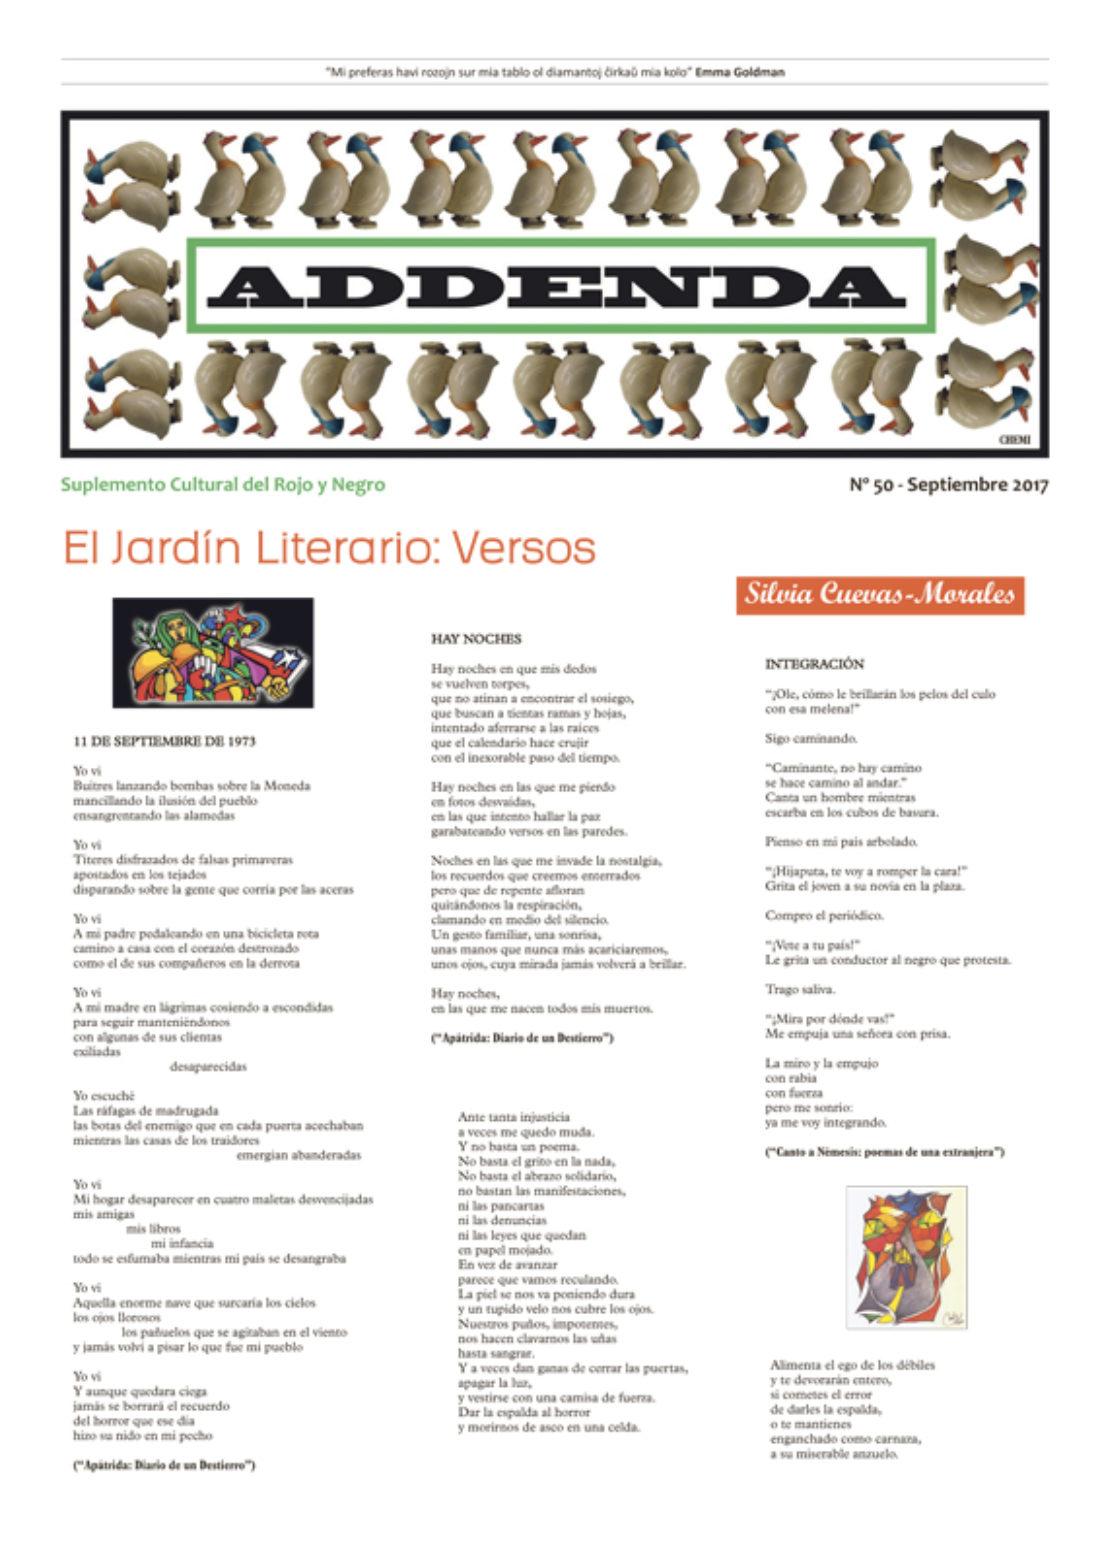 Addenda, suplemento cultural del RyN – Nº 50, septiembre 2017